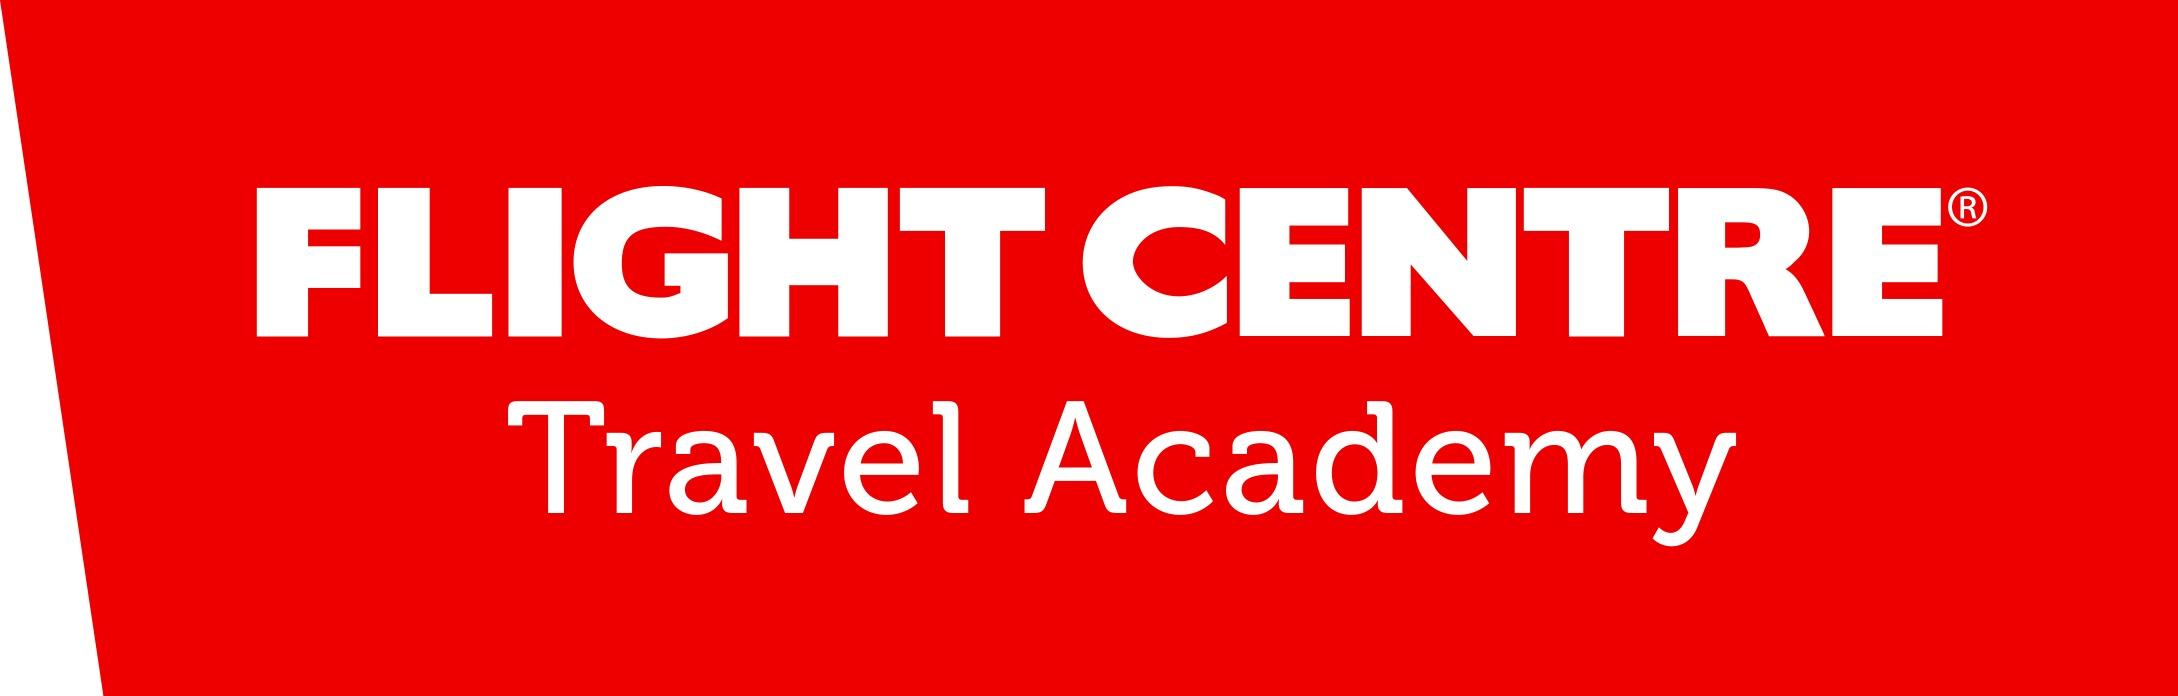 Flight Centre Travel Academy Team